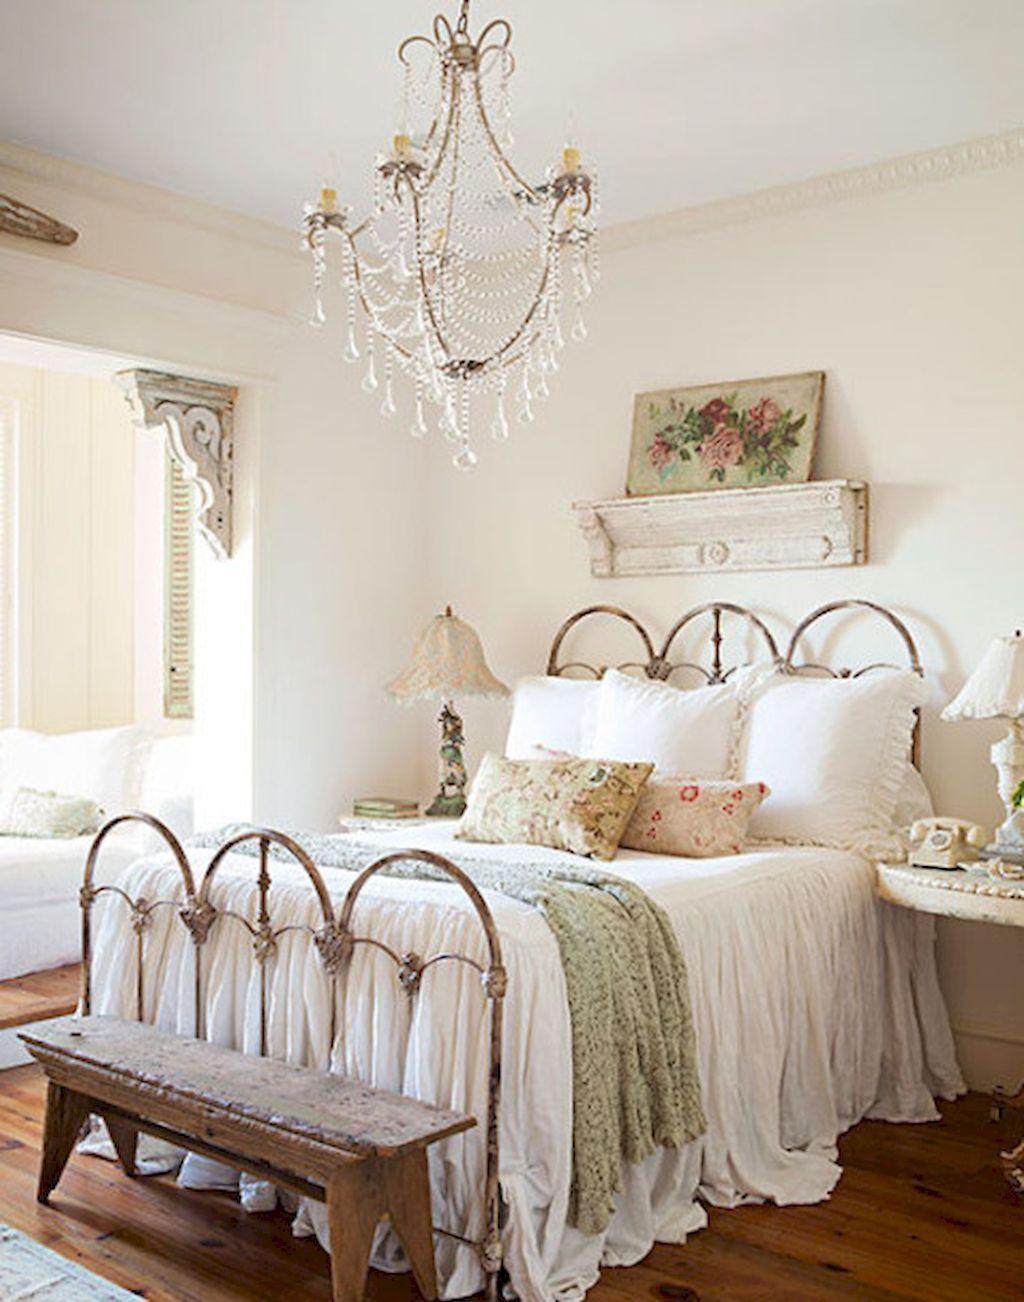 Romantic Shabby Chic Bedroom Decorating Ideas (41 | Romantic shabby on small cottage bedroom decorating ideas, vintage cottage bedroom decorating ideas, shabby vintage cottage bedroom,